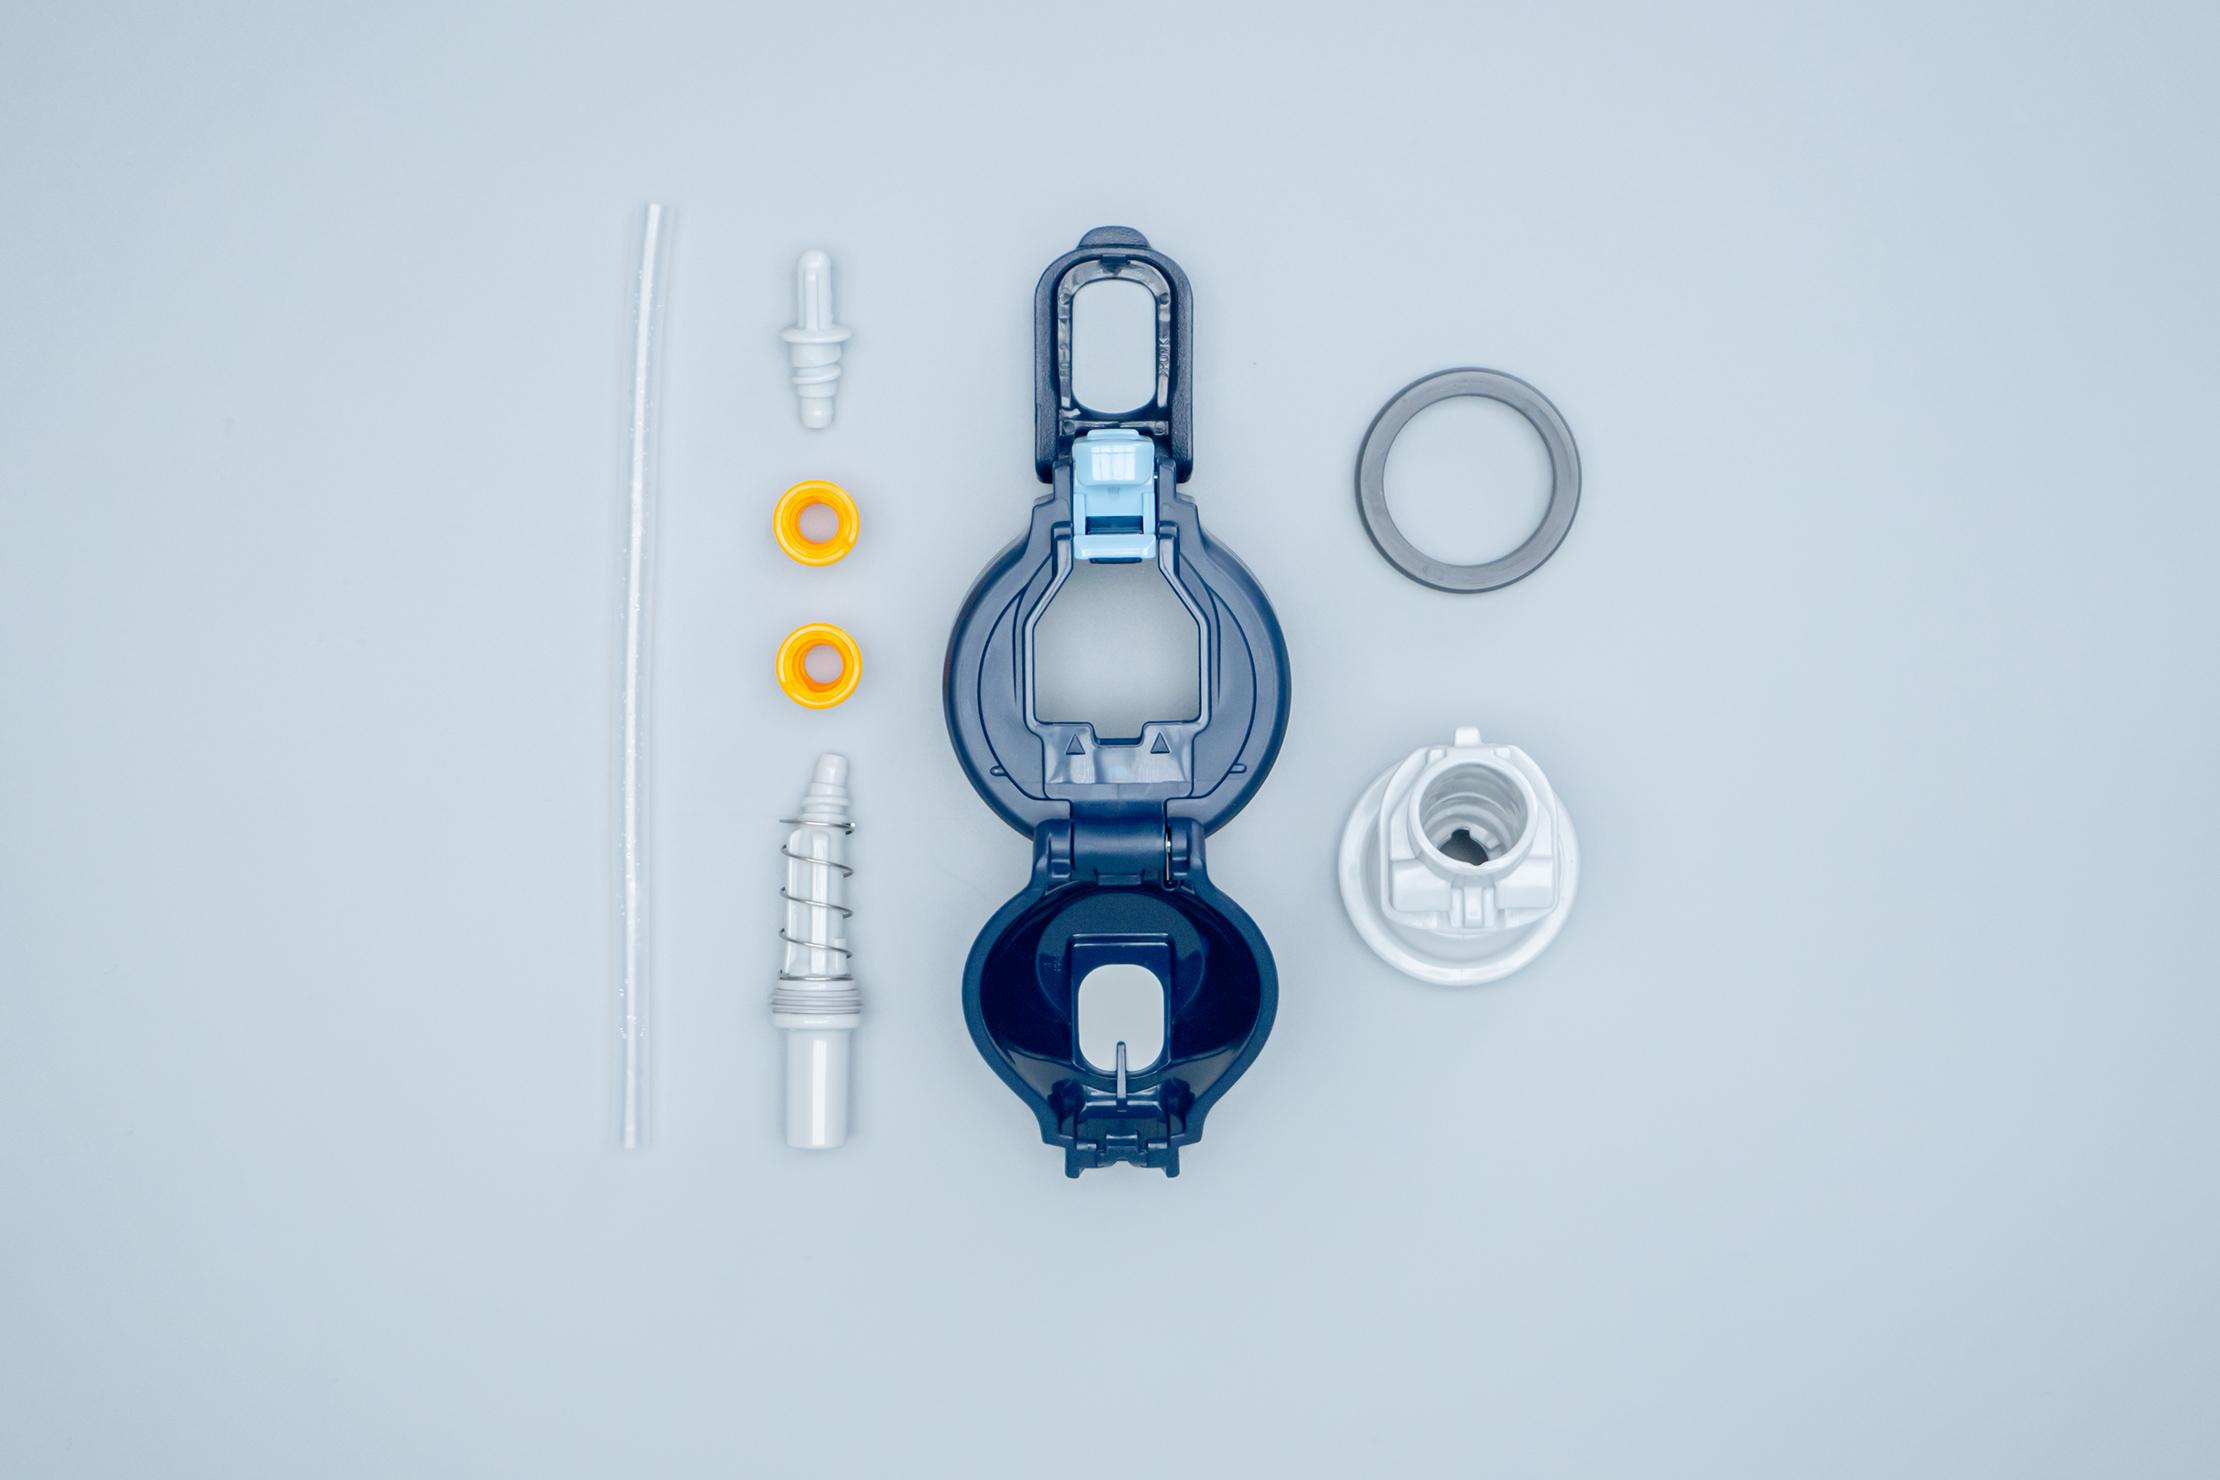 Zojirushi Cool Bottle Lid Components